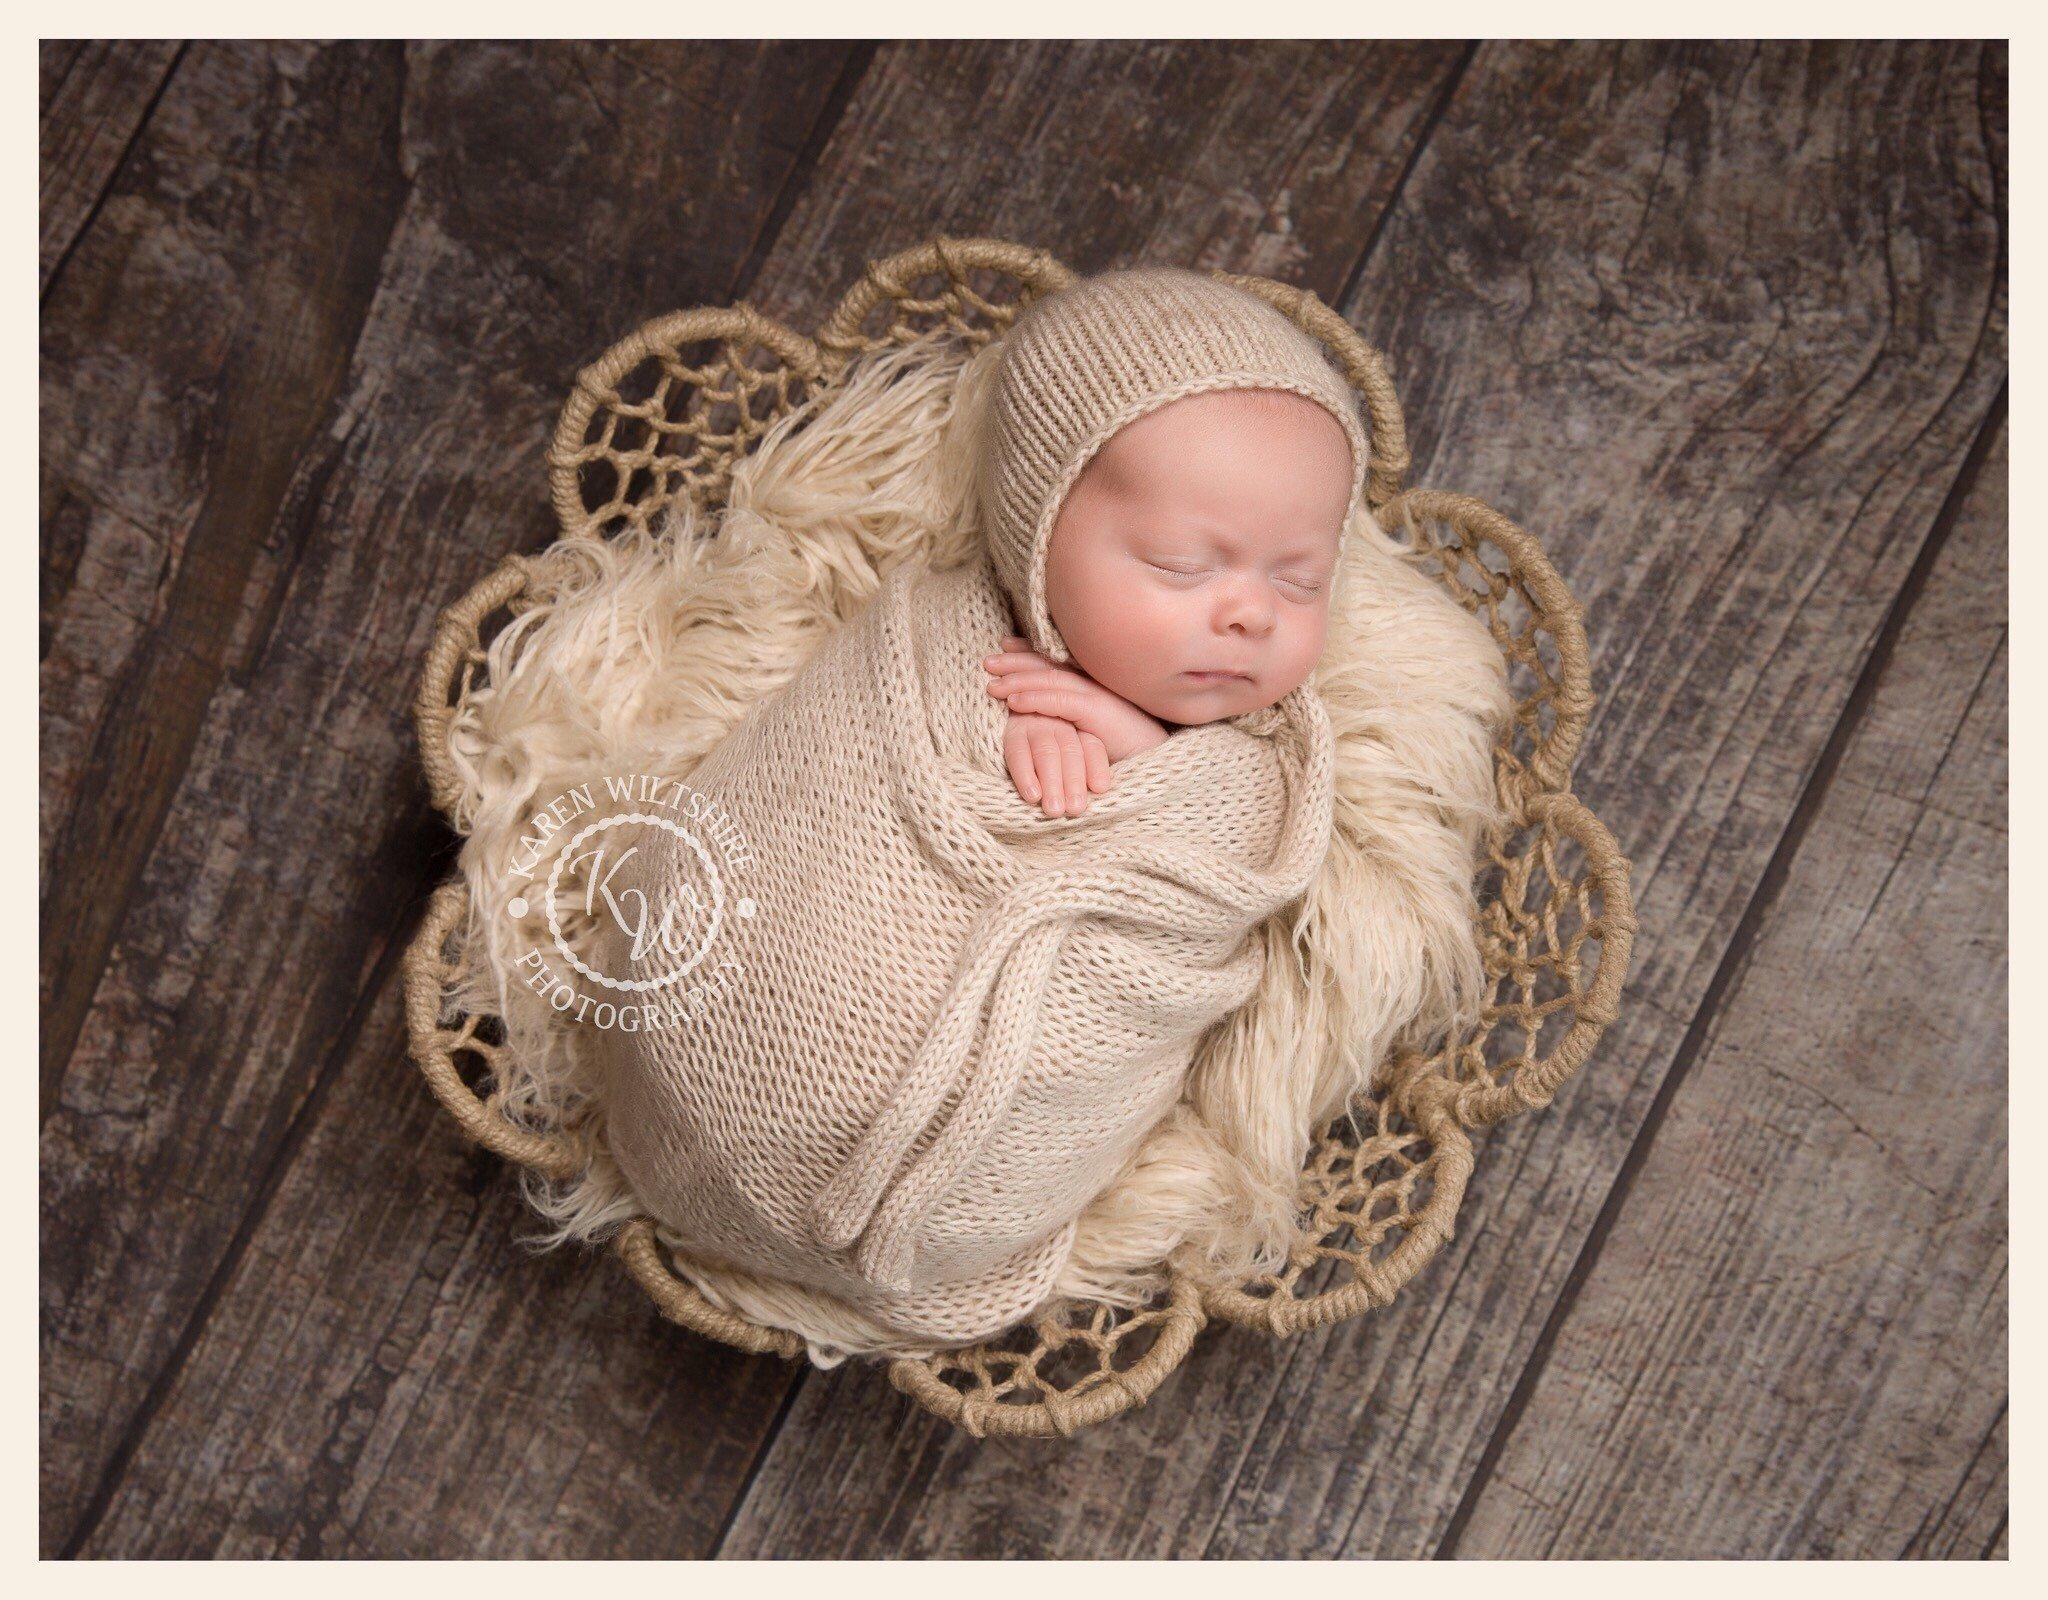 Jute Newborn Photography Basket Props Baby Flokati Photo Shoot Accessories Basket For Studio Posing Bowl Prop